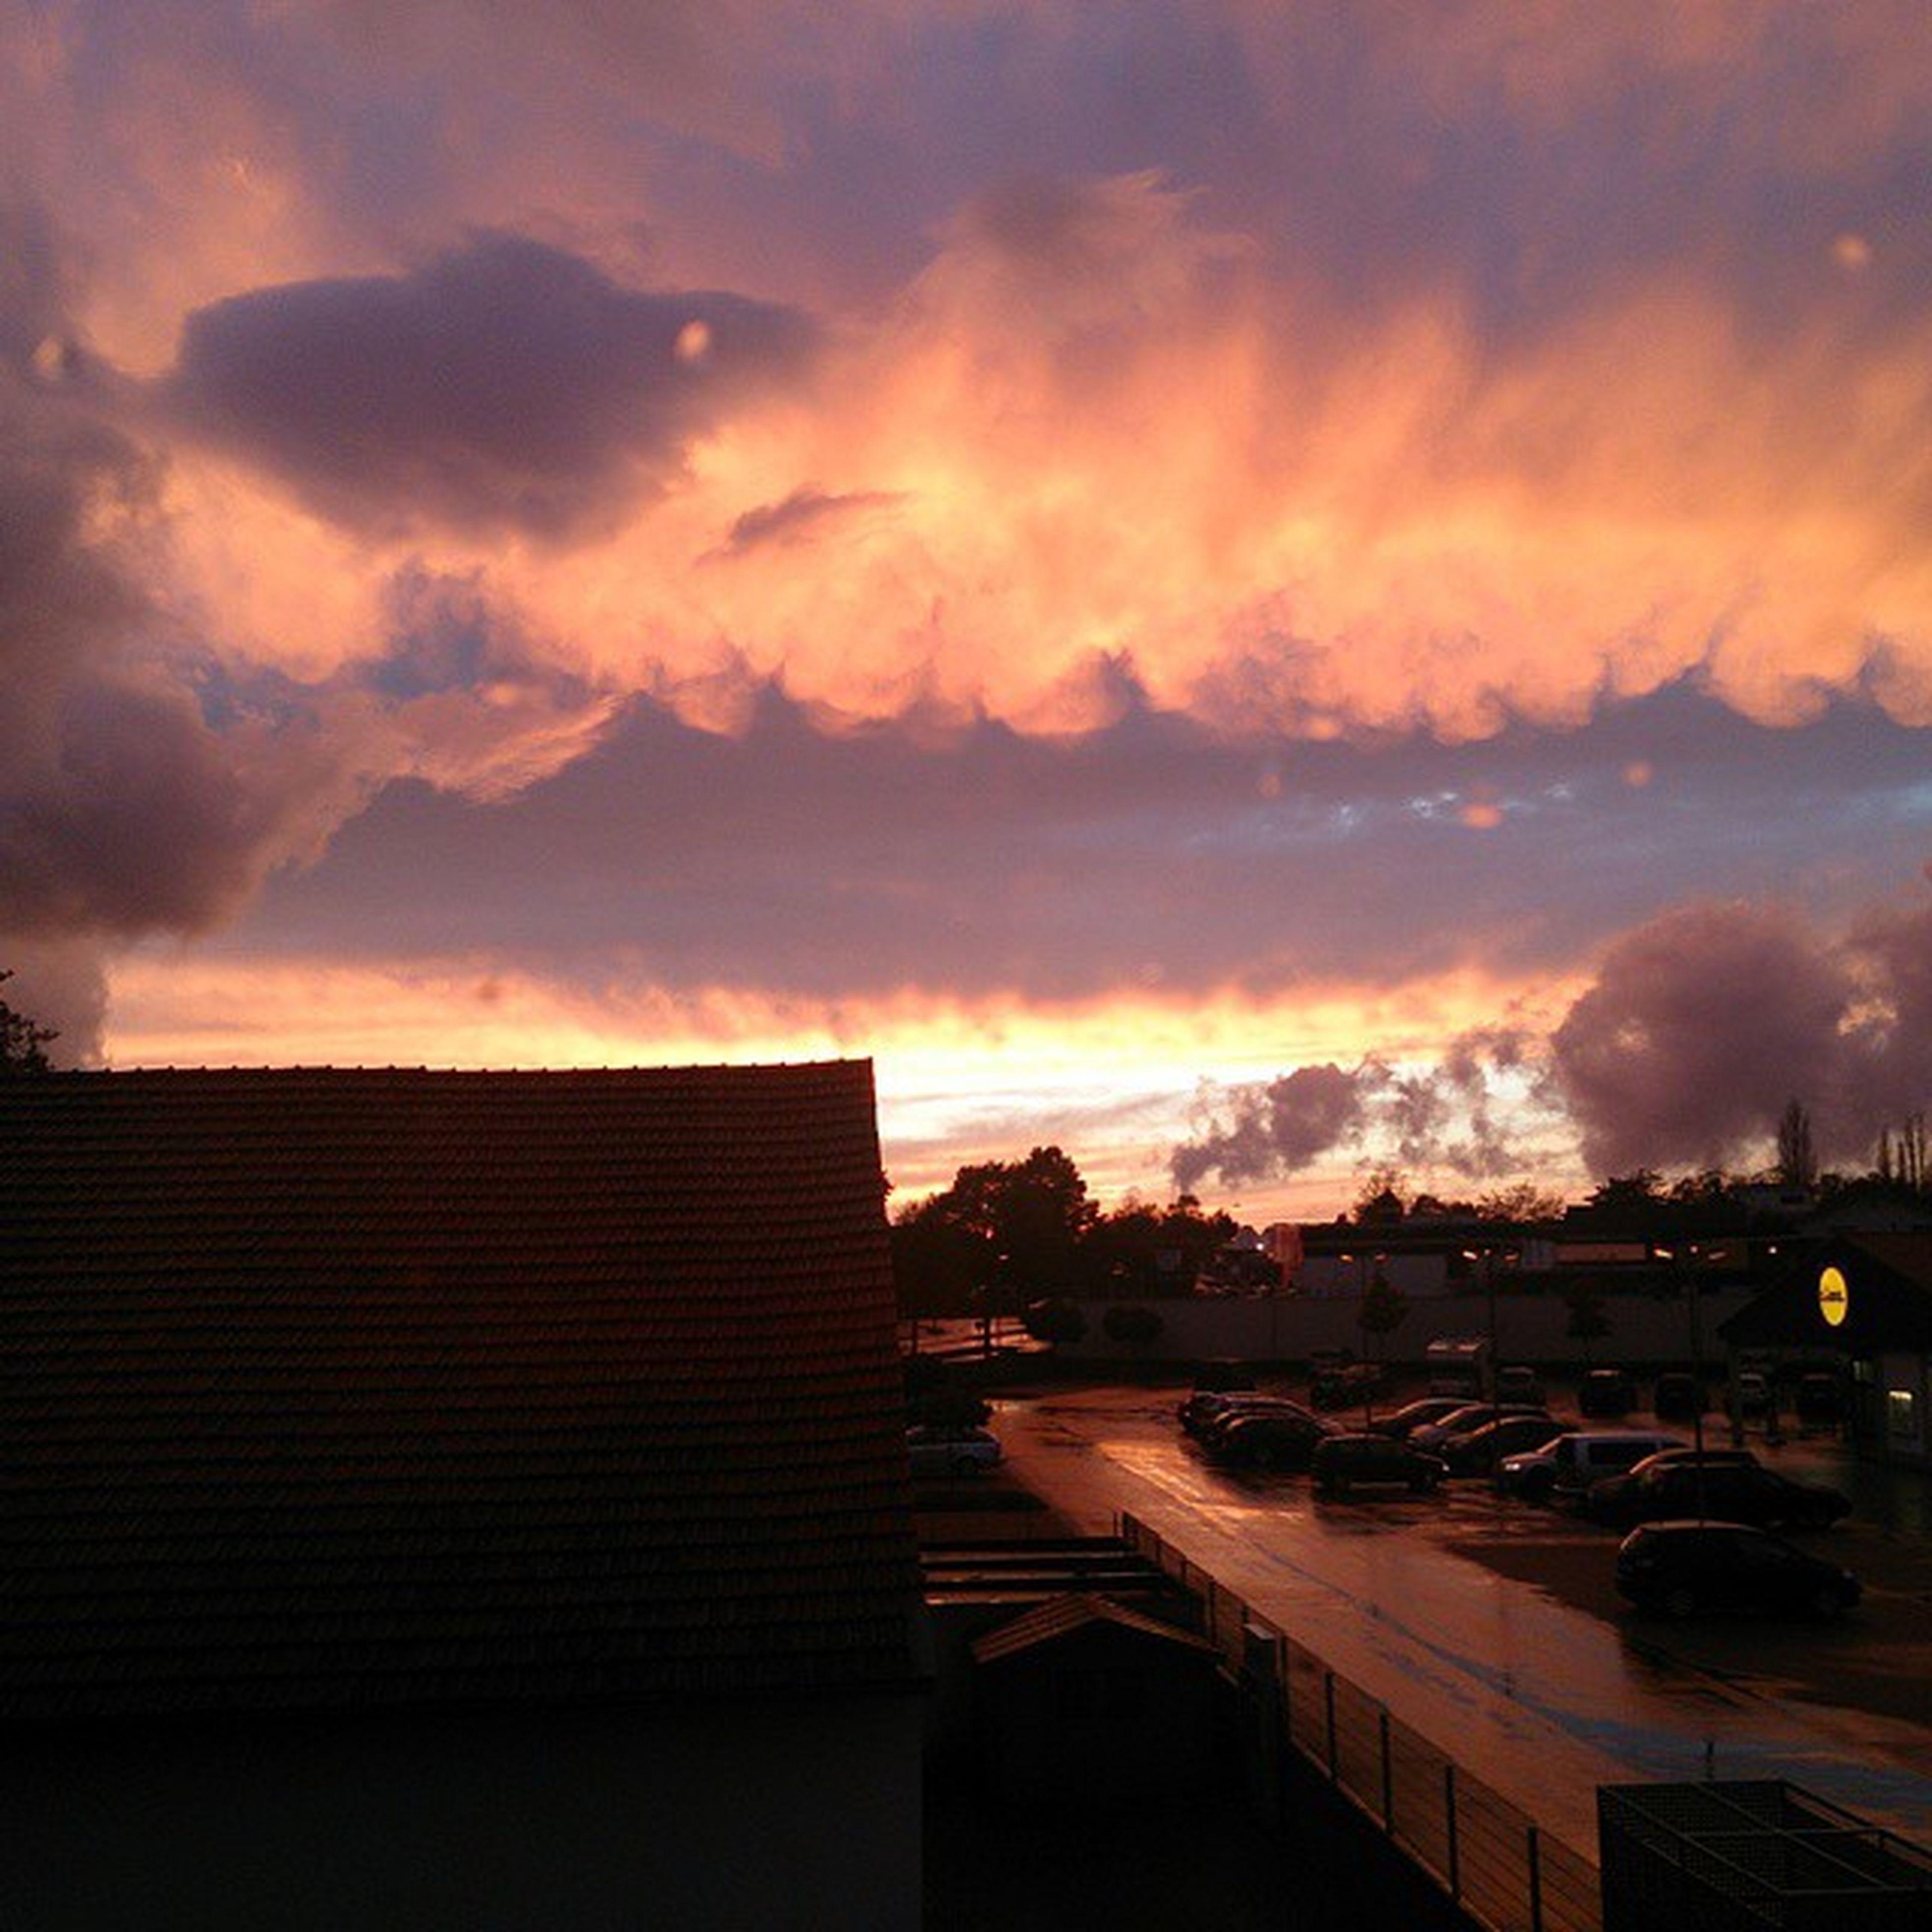 sunset, sky, architecture, building exterior, cloud - sky, built structure, orange color, city, cloudy, transportation, dramatic sky, cloud, dusk, weather, road, silhouette, overcast, car, illuminated, outdoors